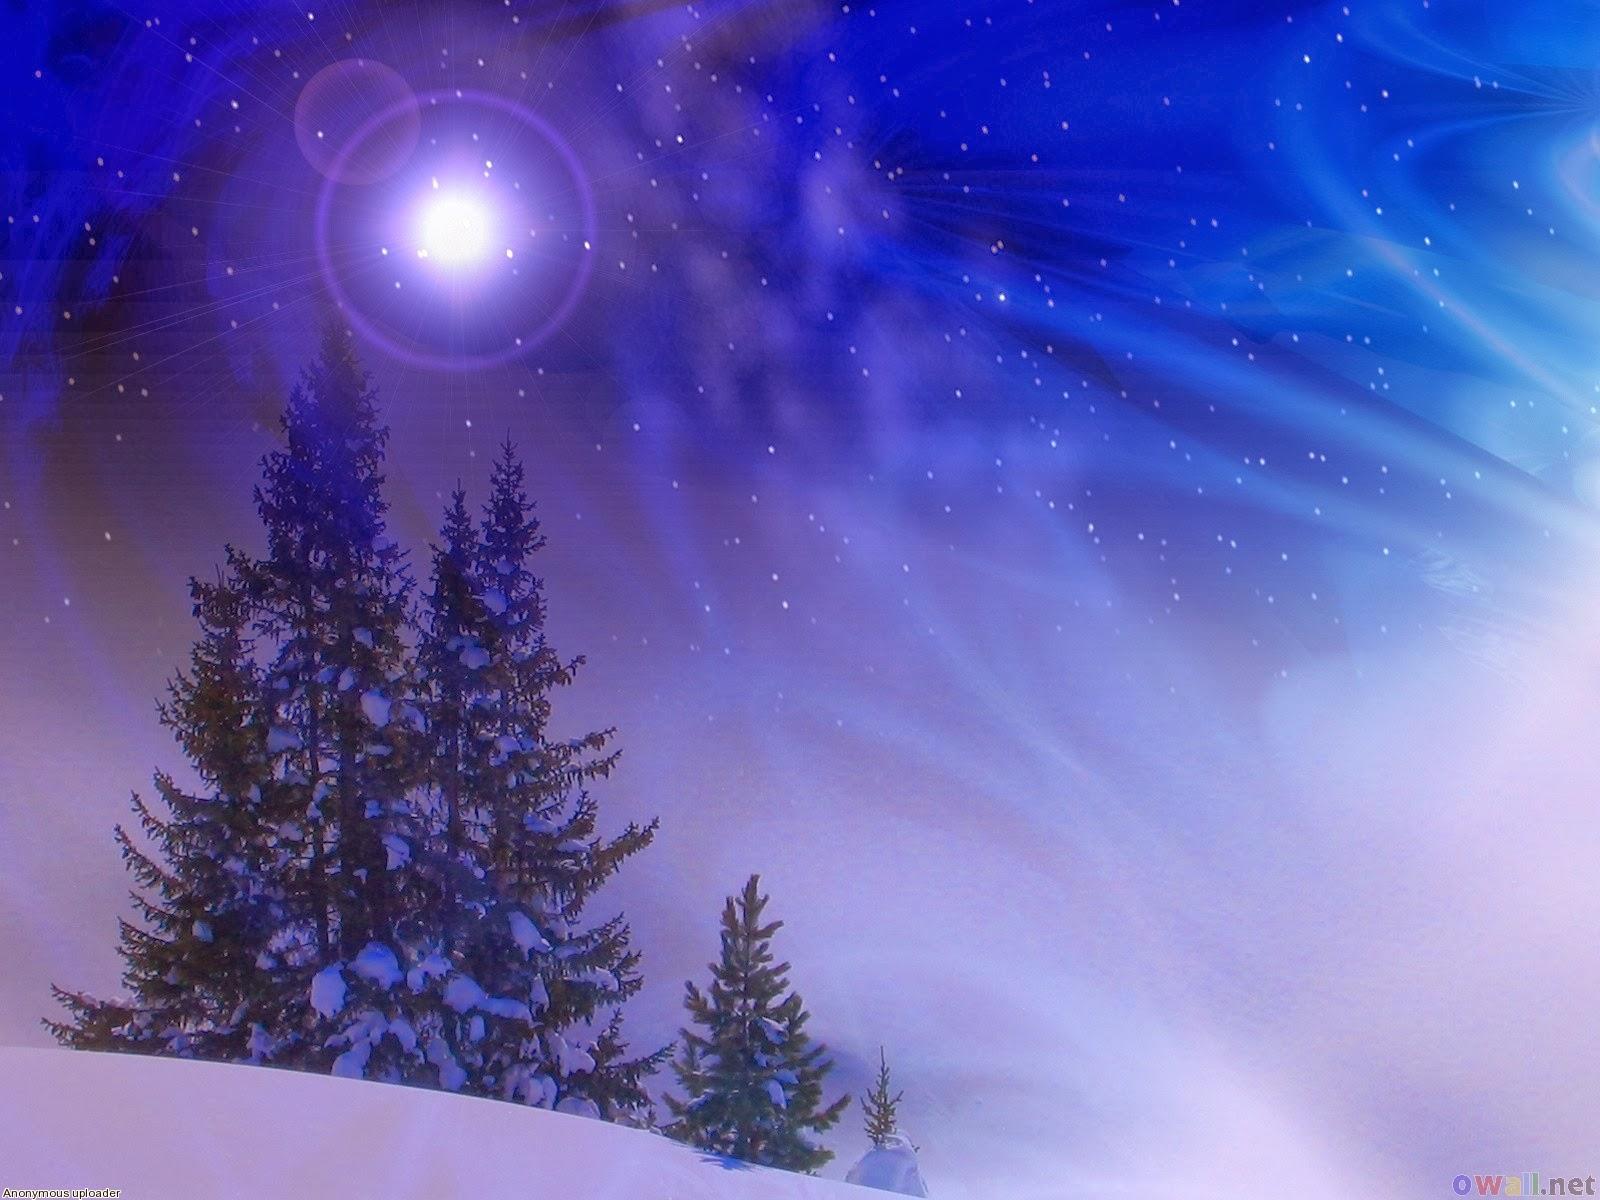 wallpaper winter night - photo #20